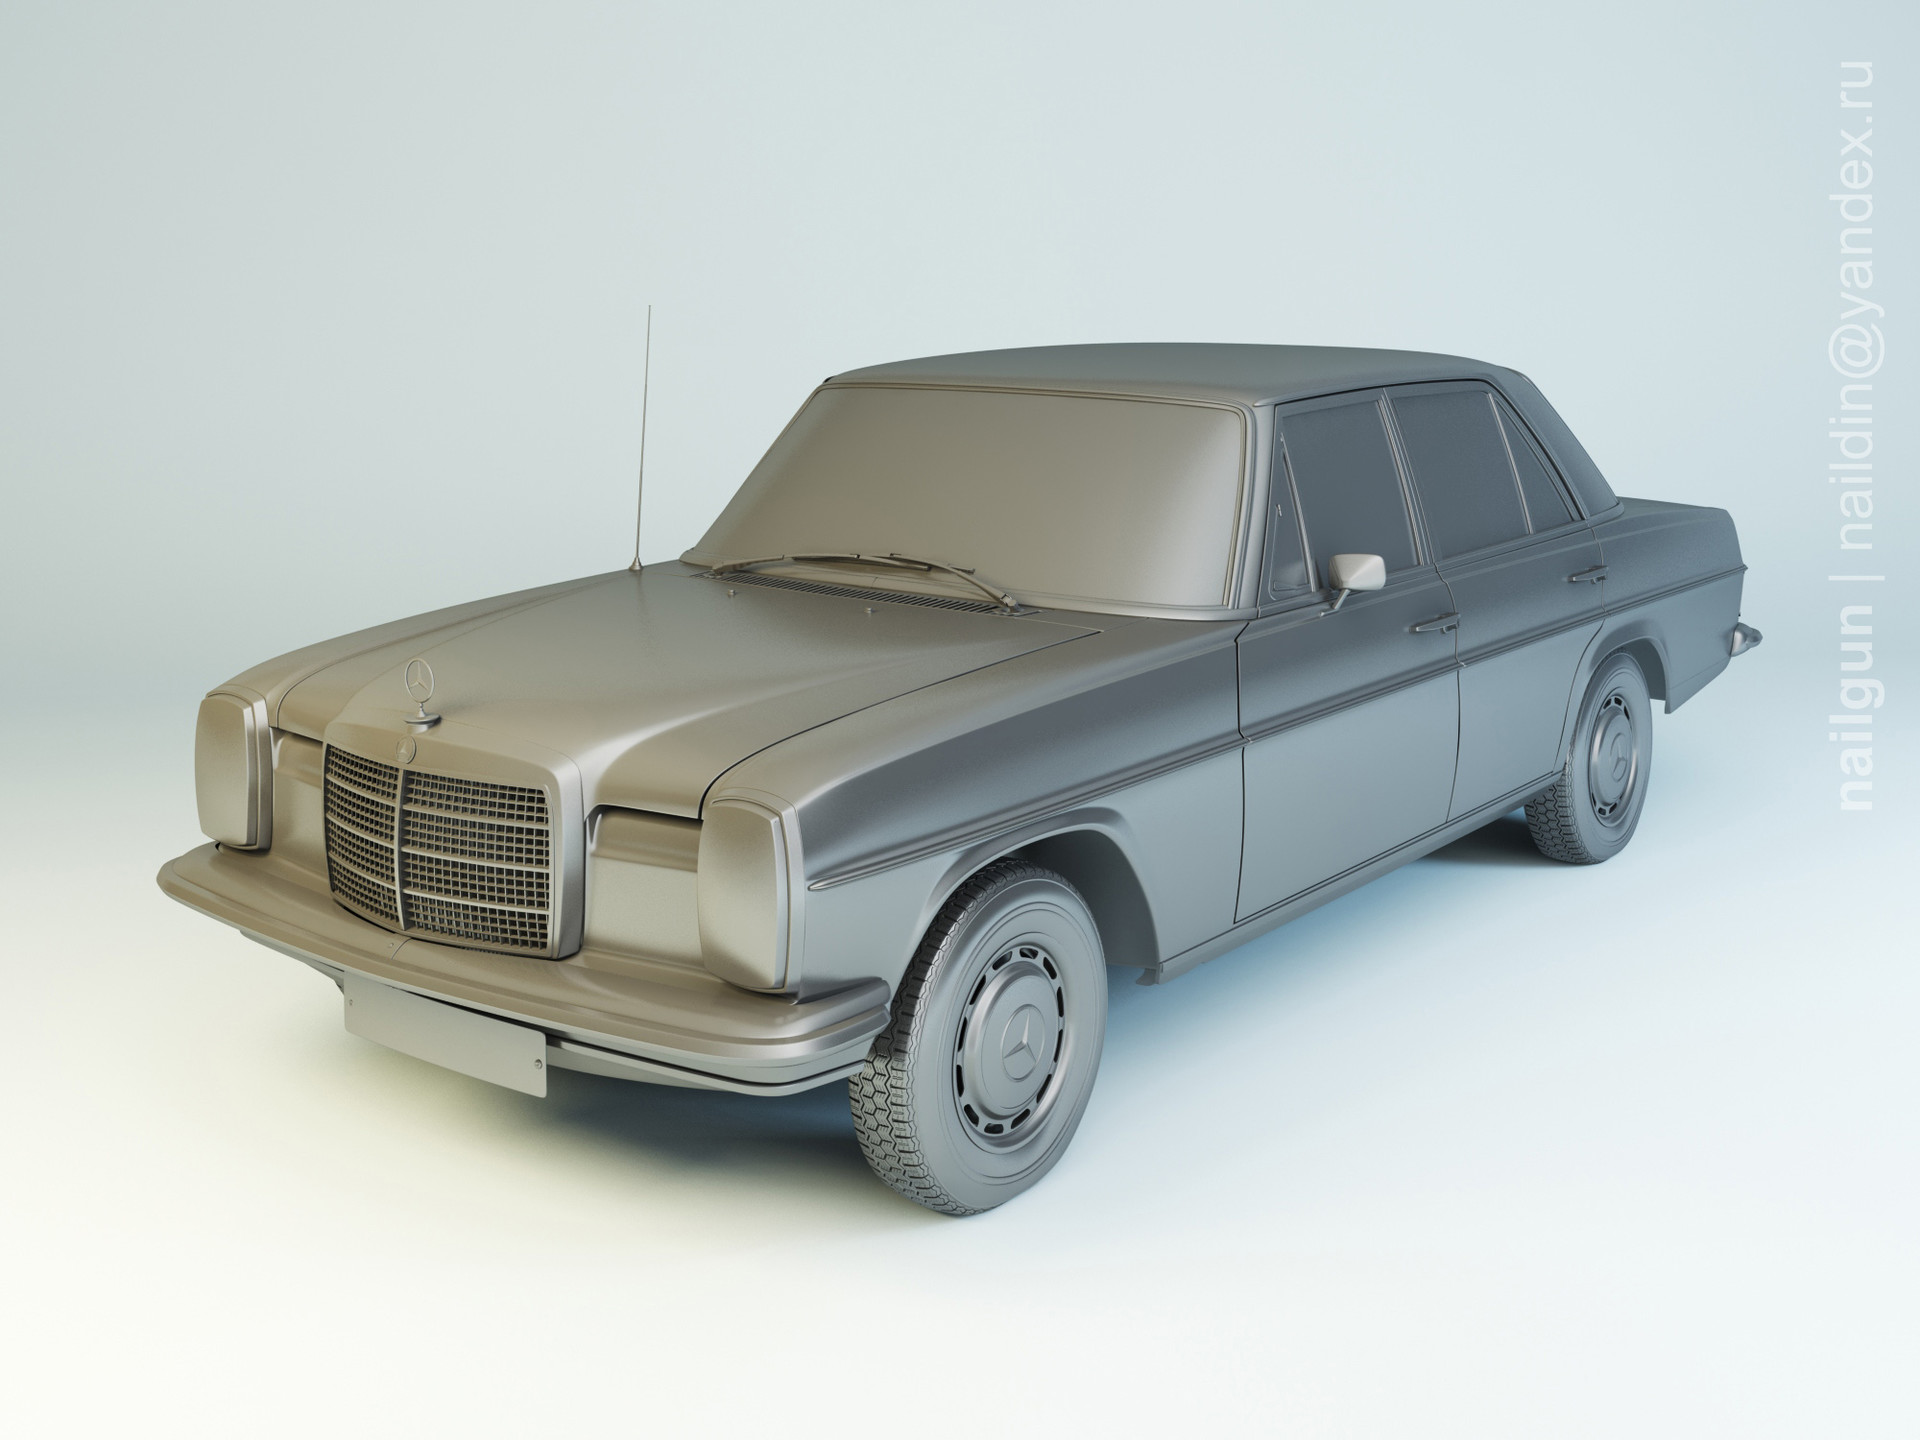 Nail khusnutdinov pwc 070 003 mercedes w114 modelling 0